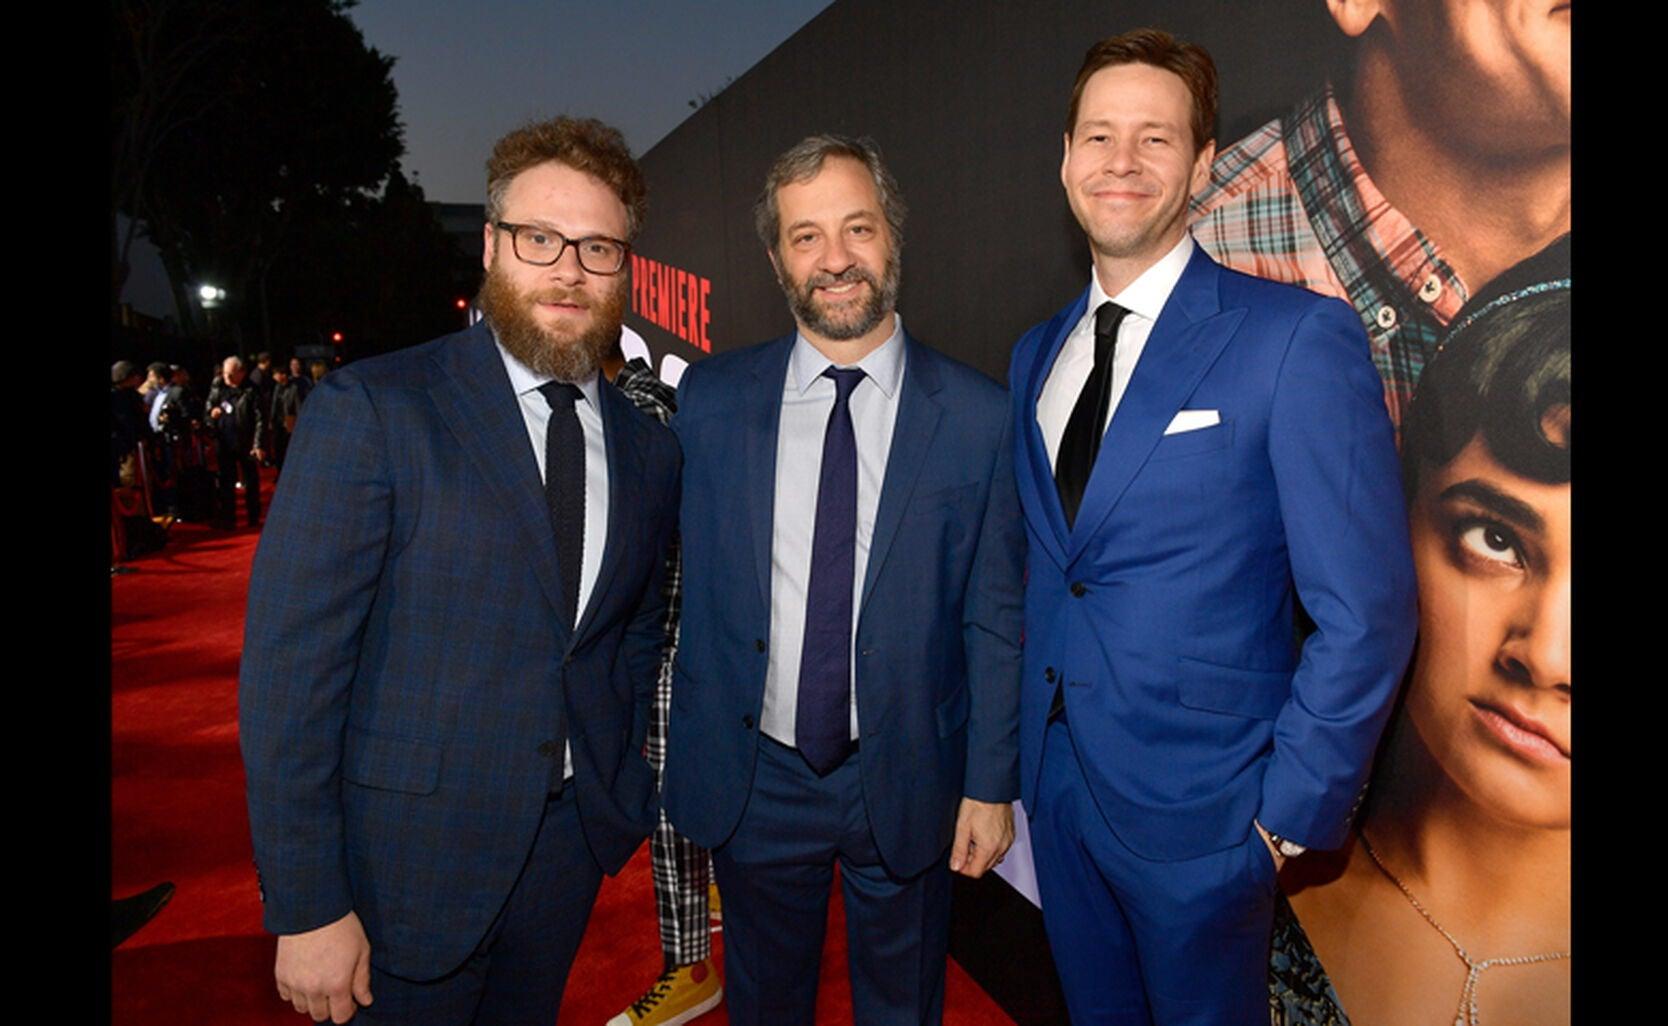 Seth Rogen, Judd Apatow and Ike Barinholtz